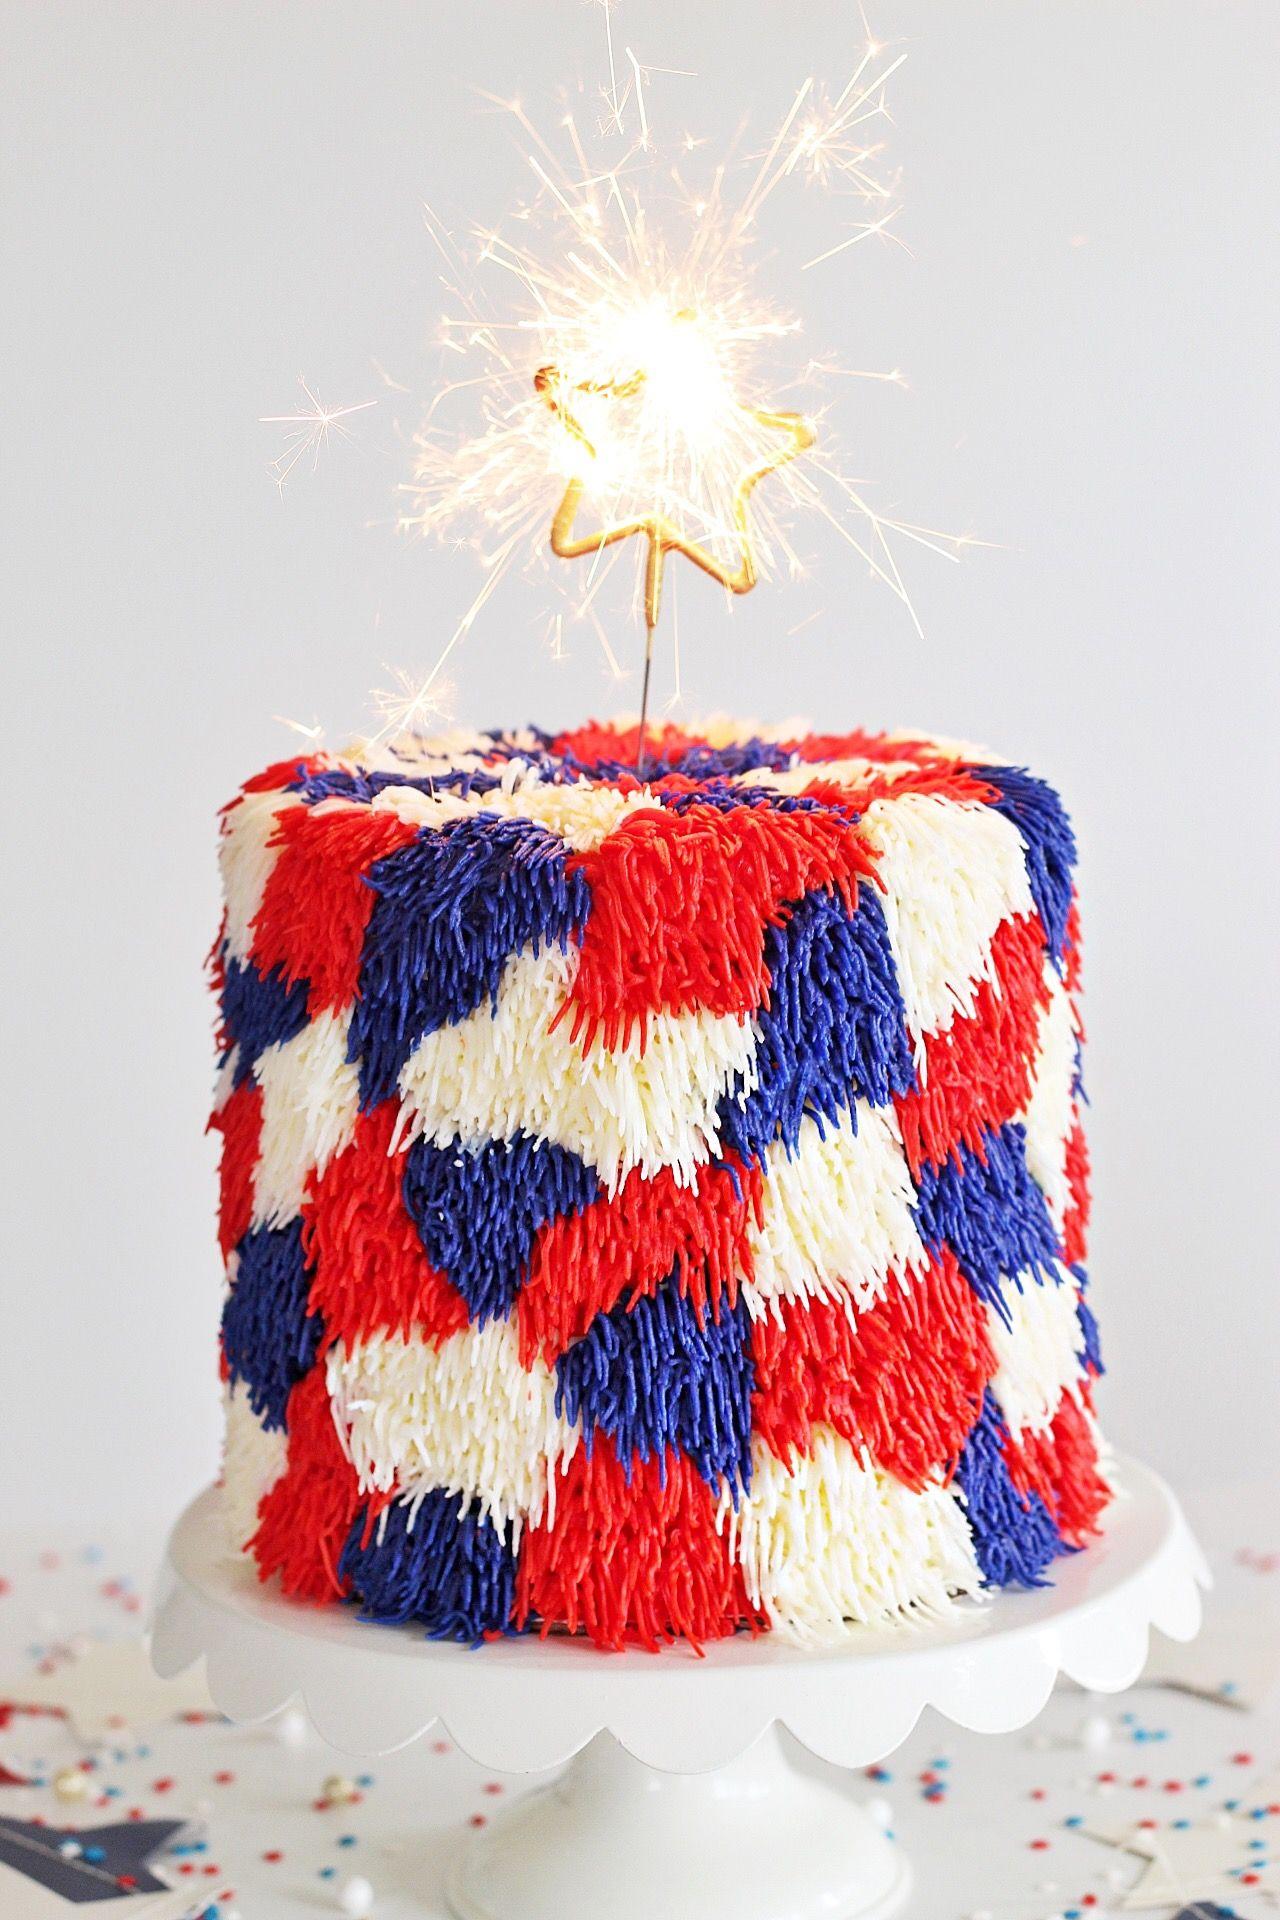 Celebration Worthy 4th of July Cakes   Cake by Courtney